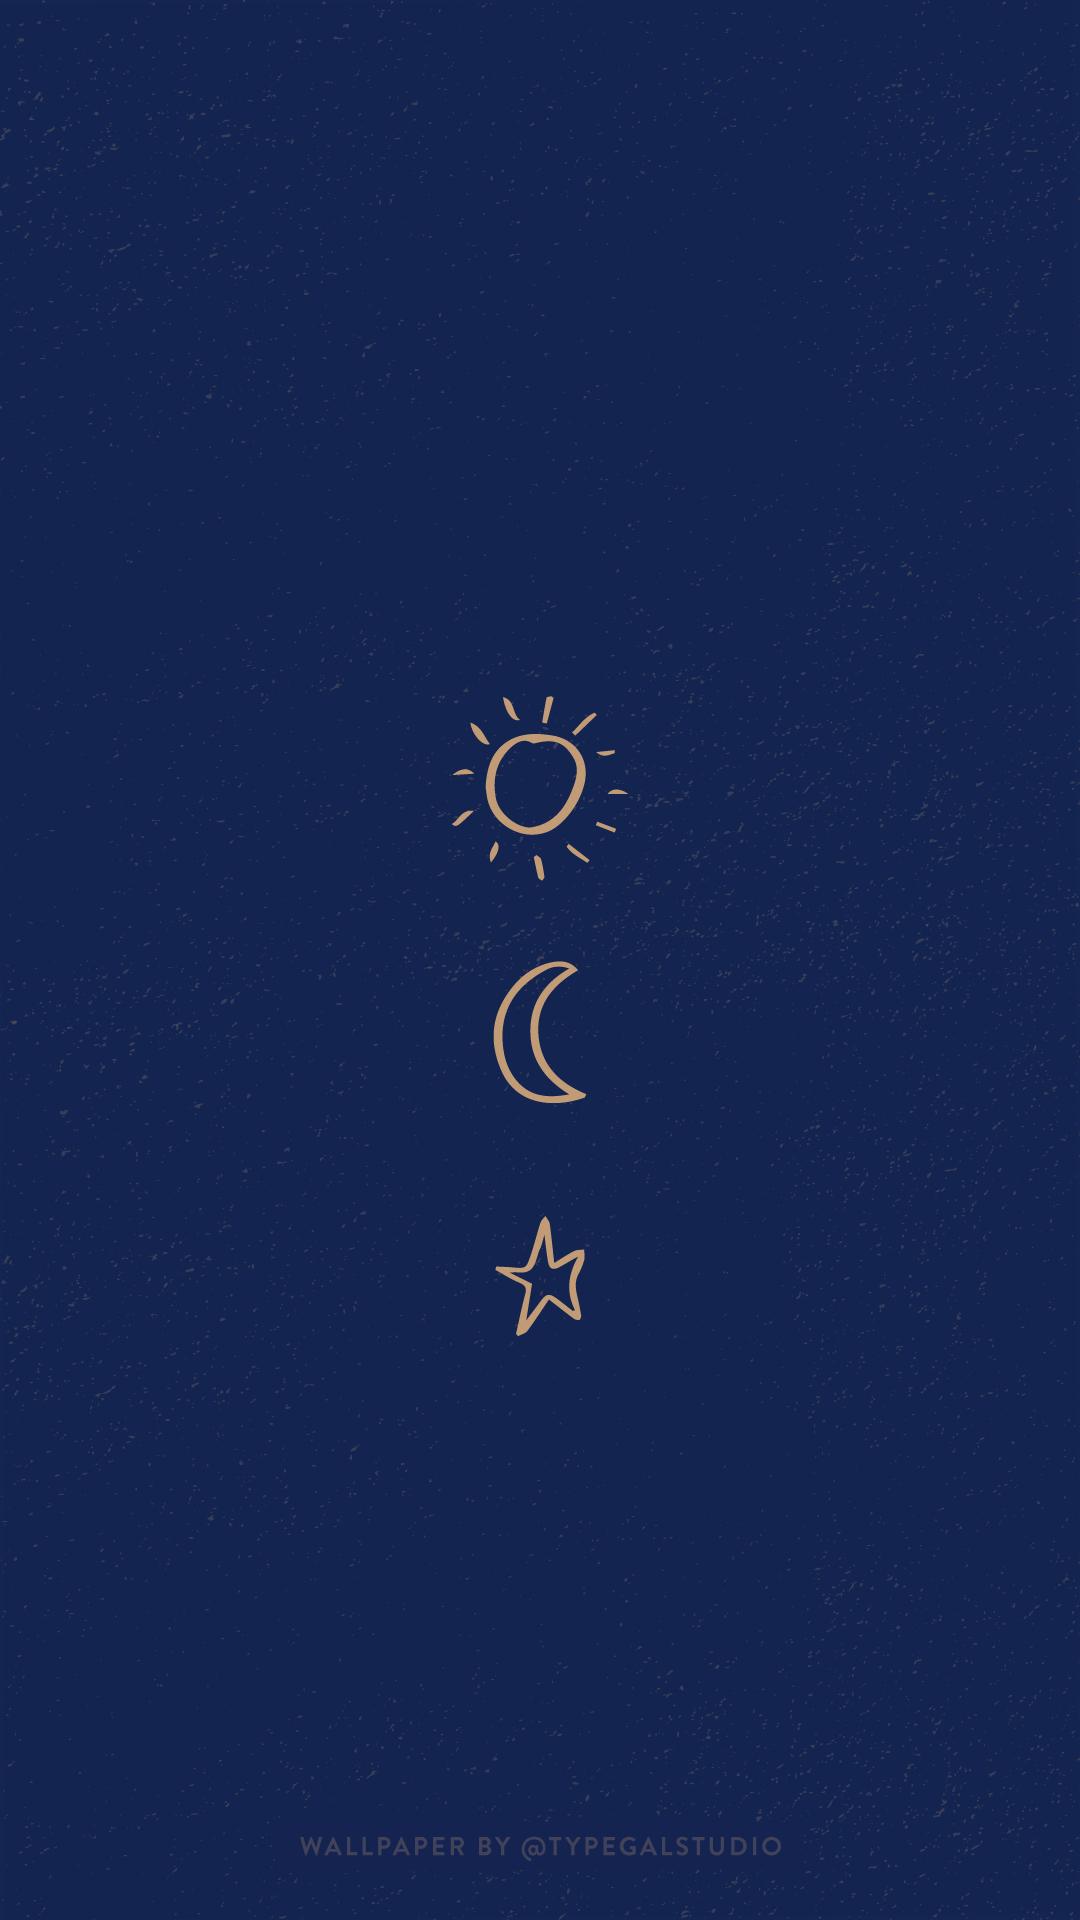 Moon And Stars Wallpaper Aesthetic   Rehare